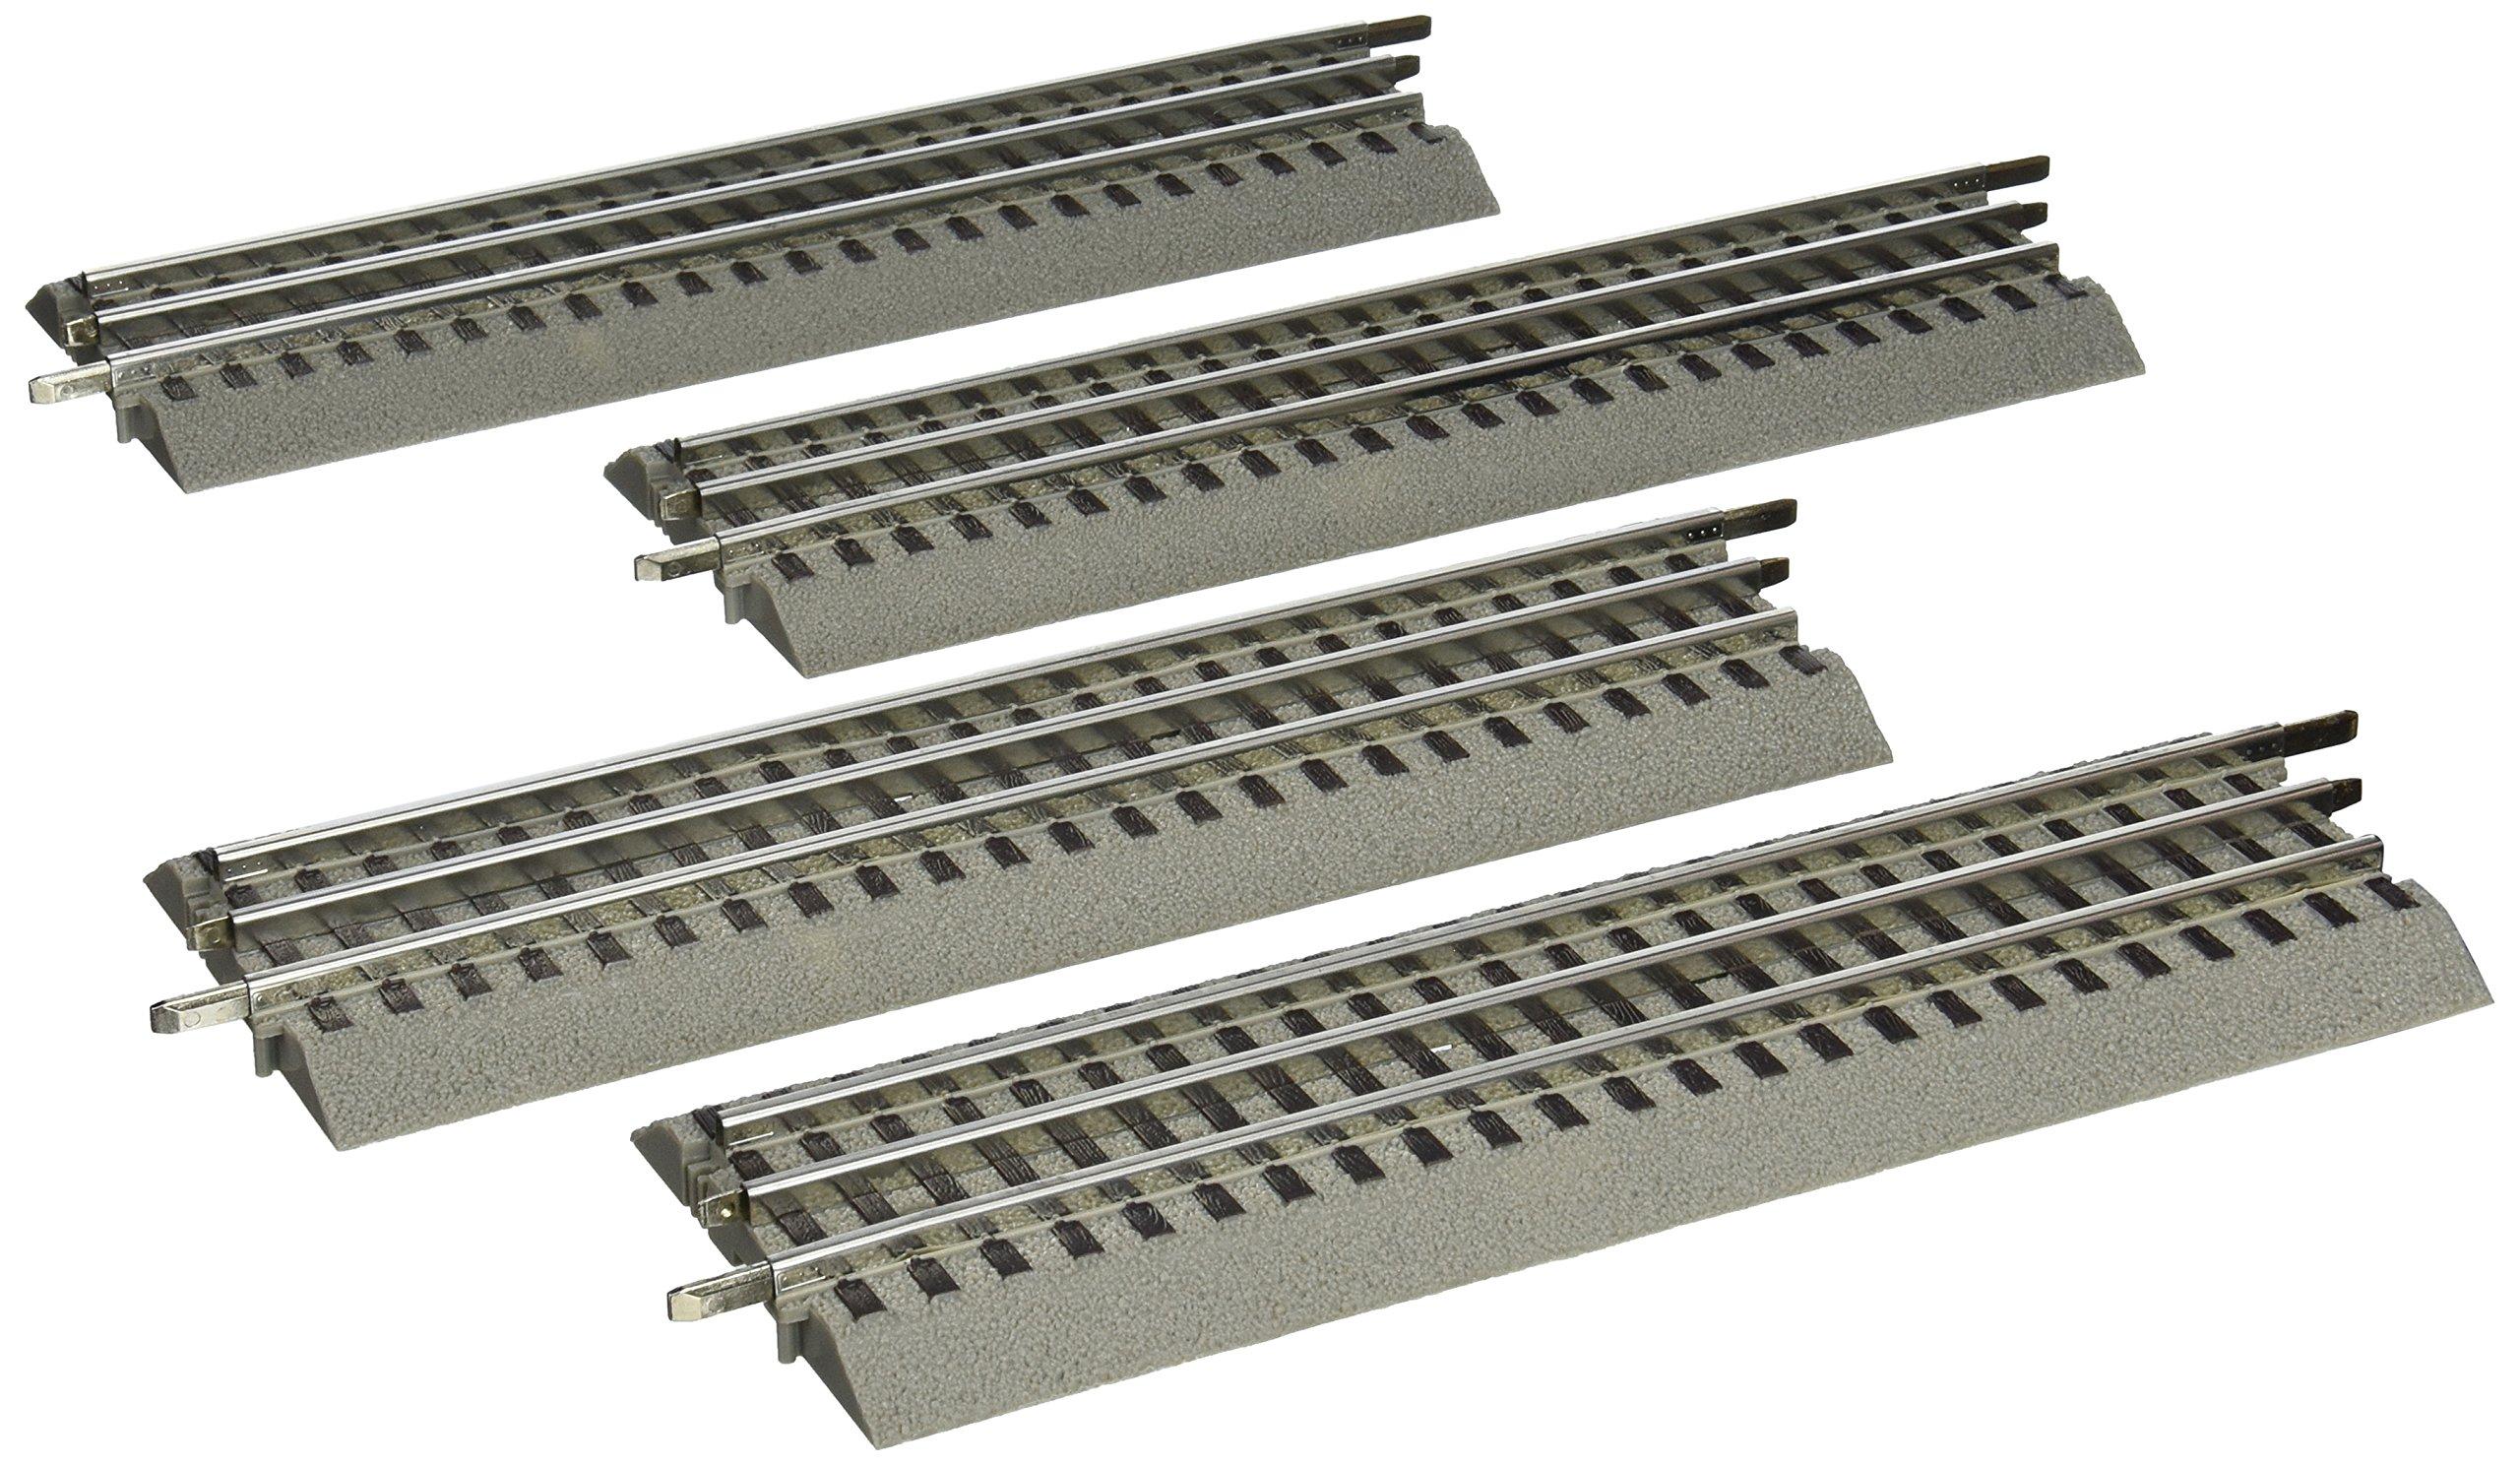 Lionel FasTrack - O-Gauge Straight Track - 4 Pack